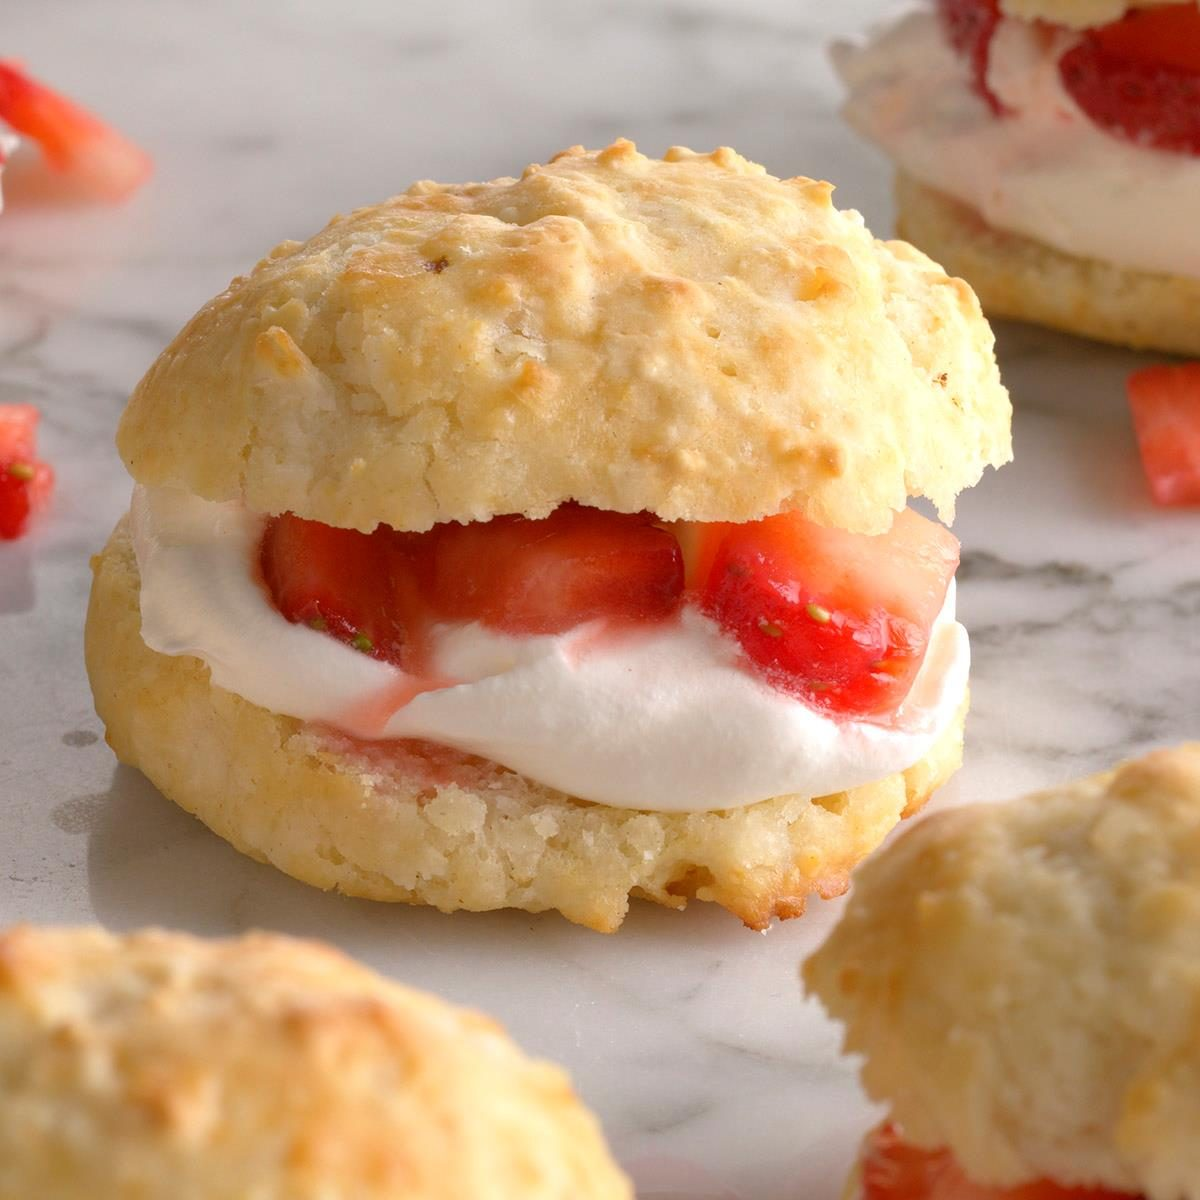 Biscuit Strawberry Shortcake Exps Qebz20 10622 B01 22 5b 2